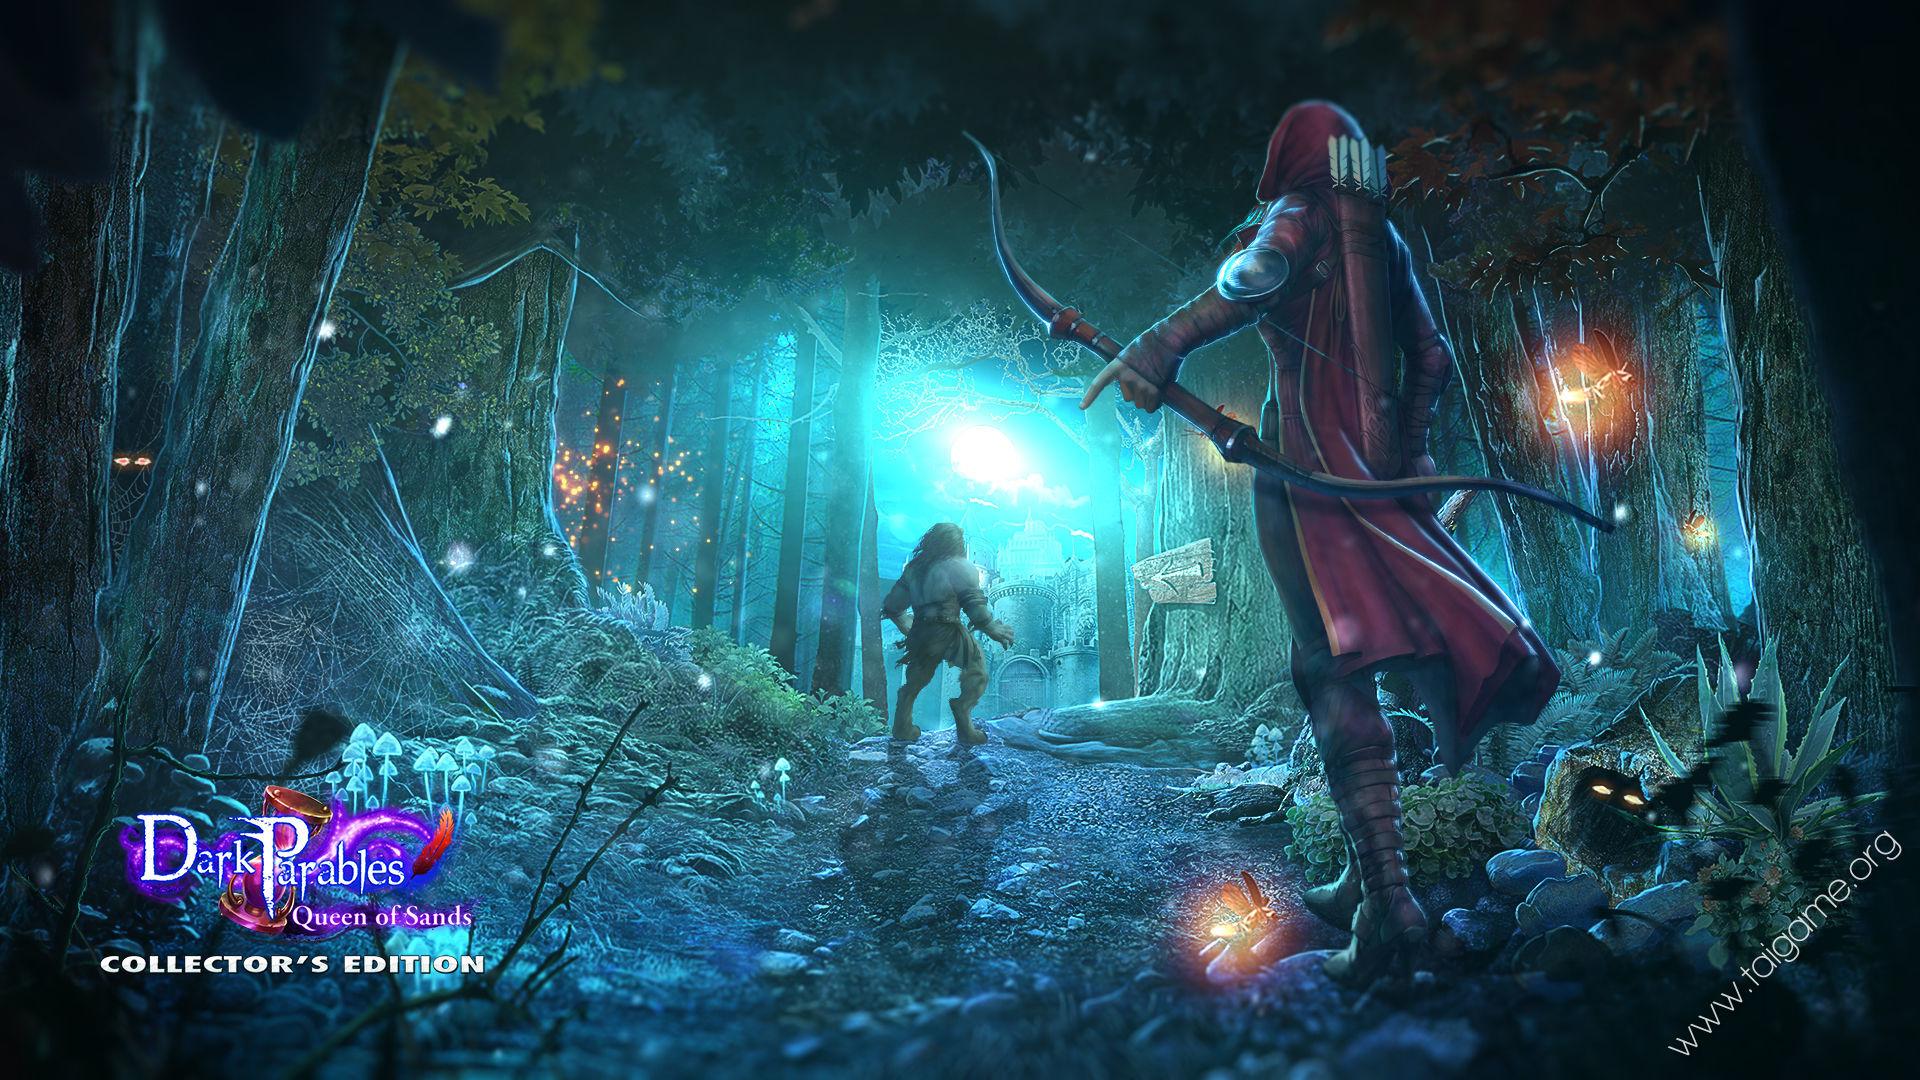 Dark Parables Games